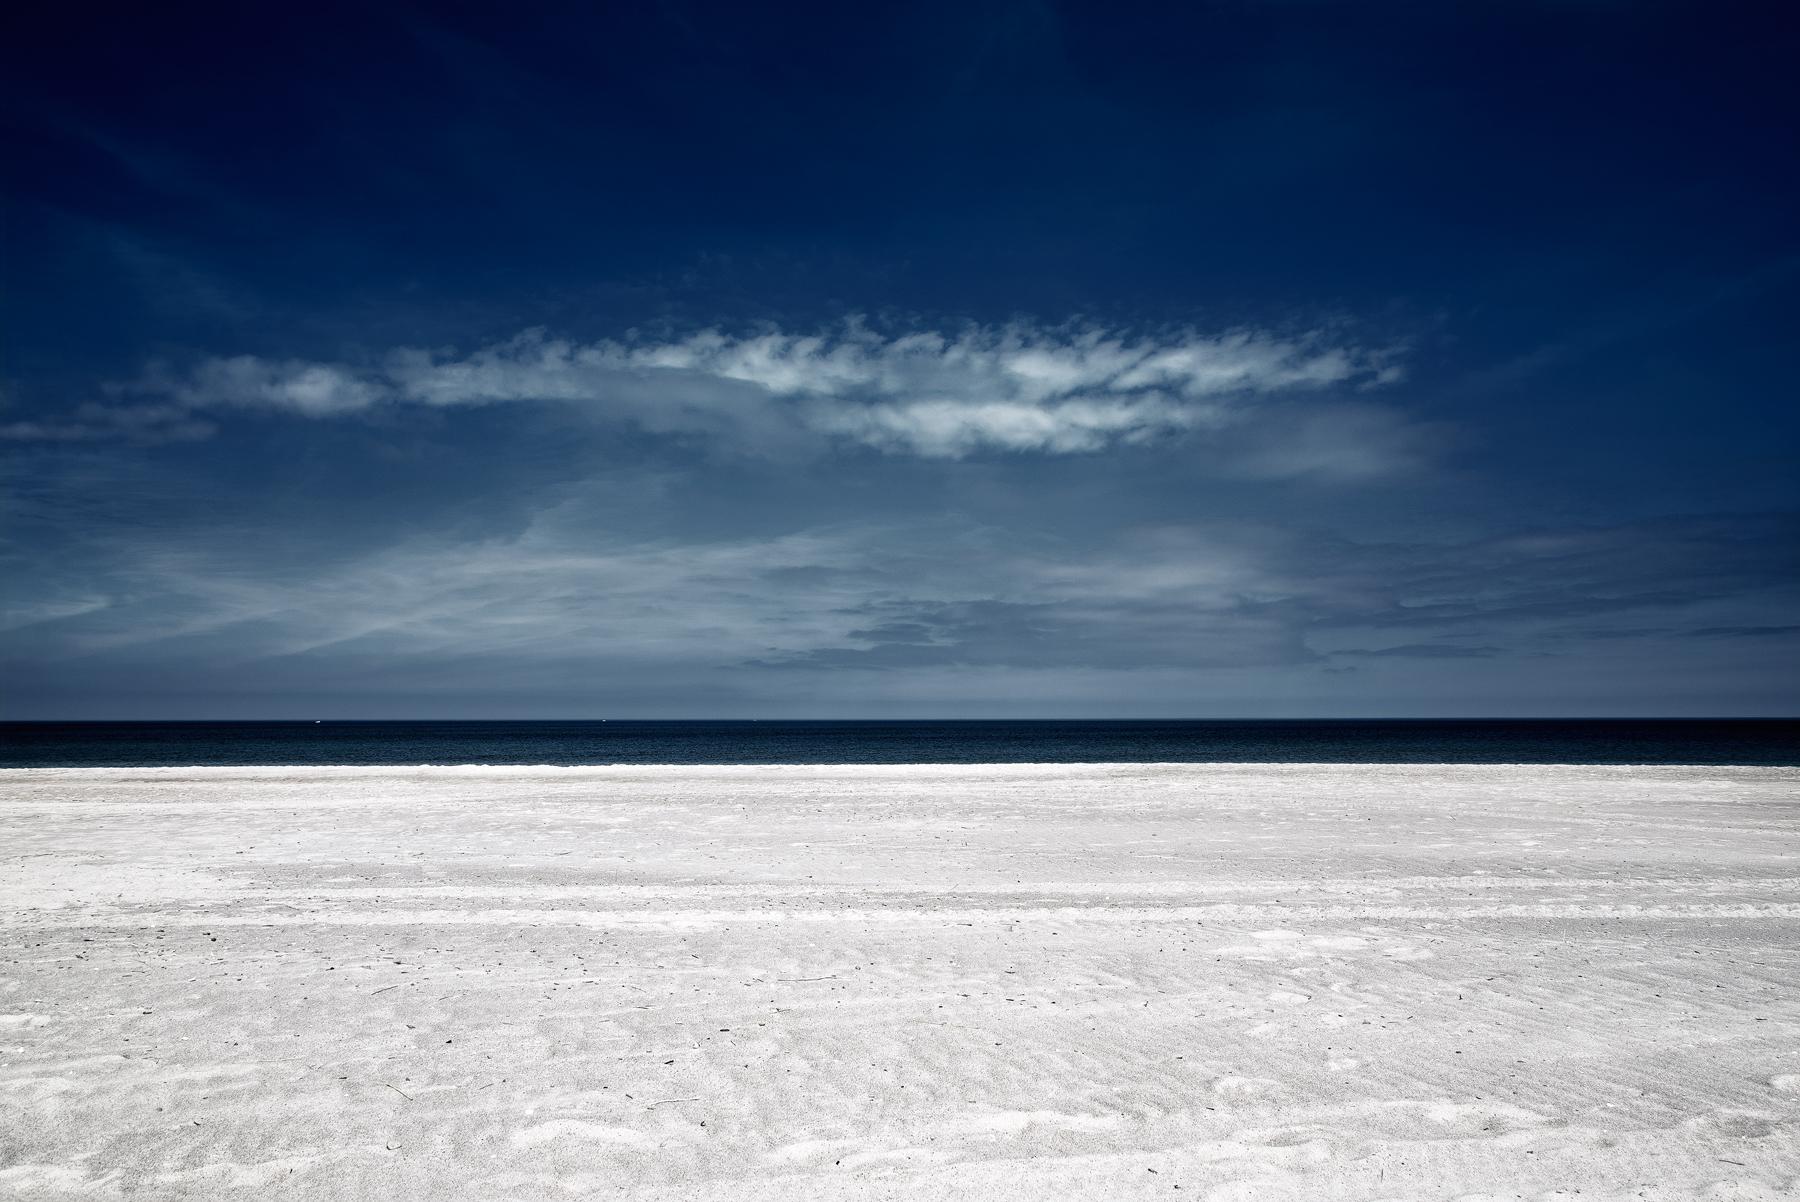 Kellie_Klein_Meditations on Water_Equilibrium_5.jpg